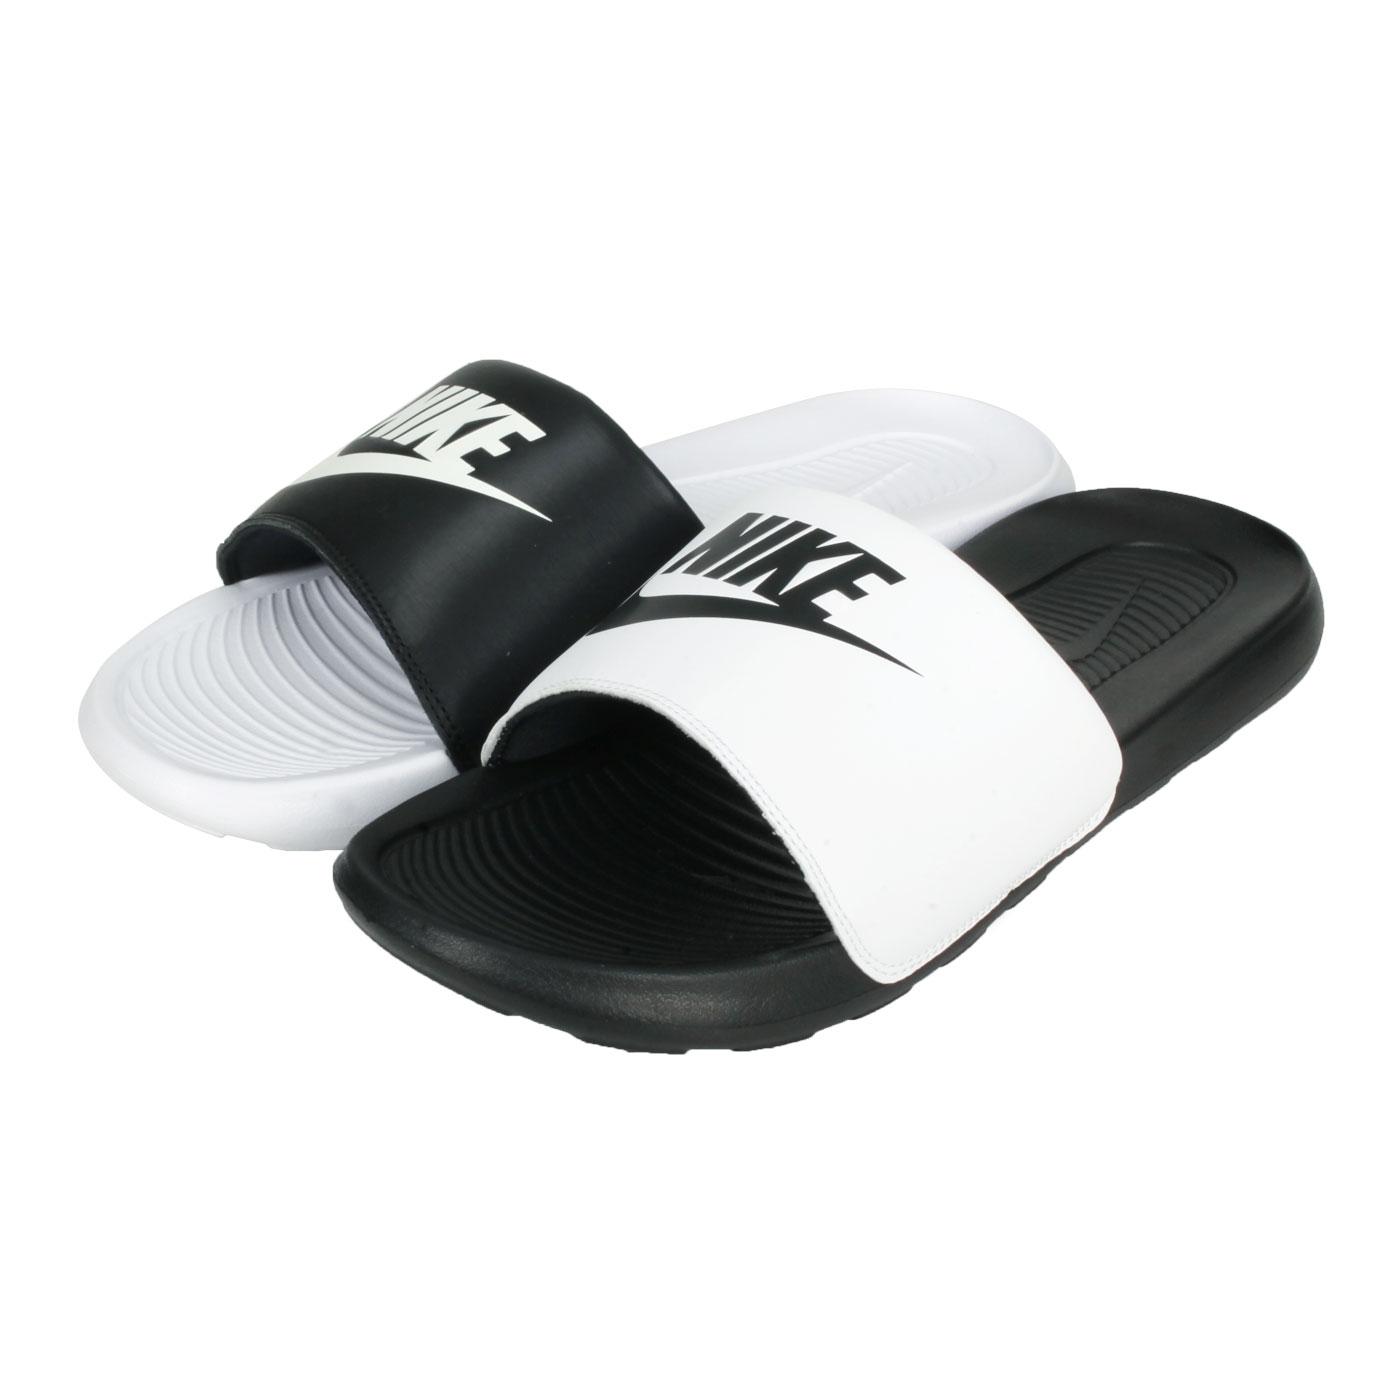 NIKE 男款休閒拖鞋  @VICTORI ONE SLIDE MIX@DD0234-100 - 黑白